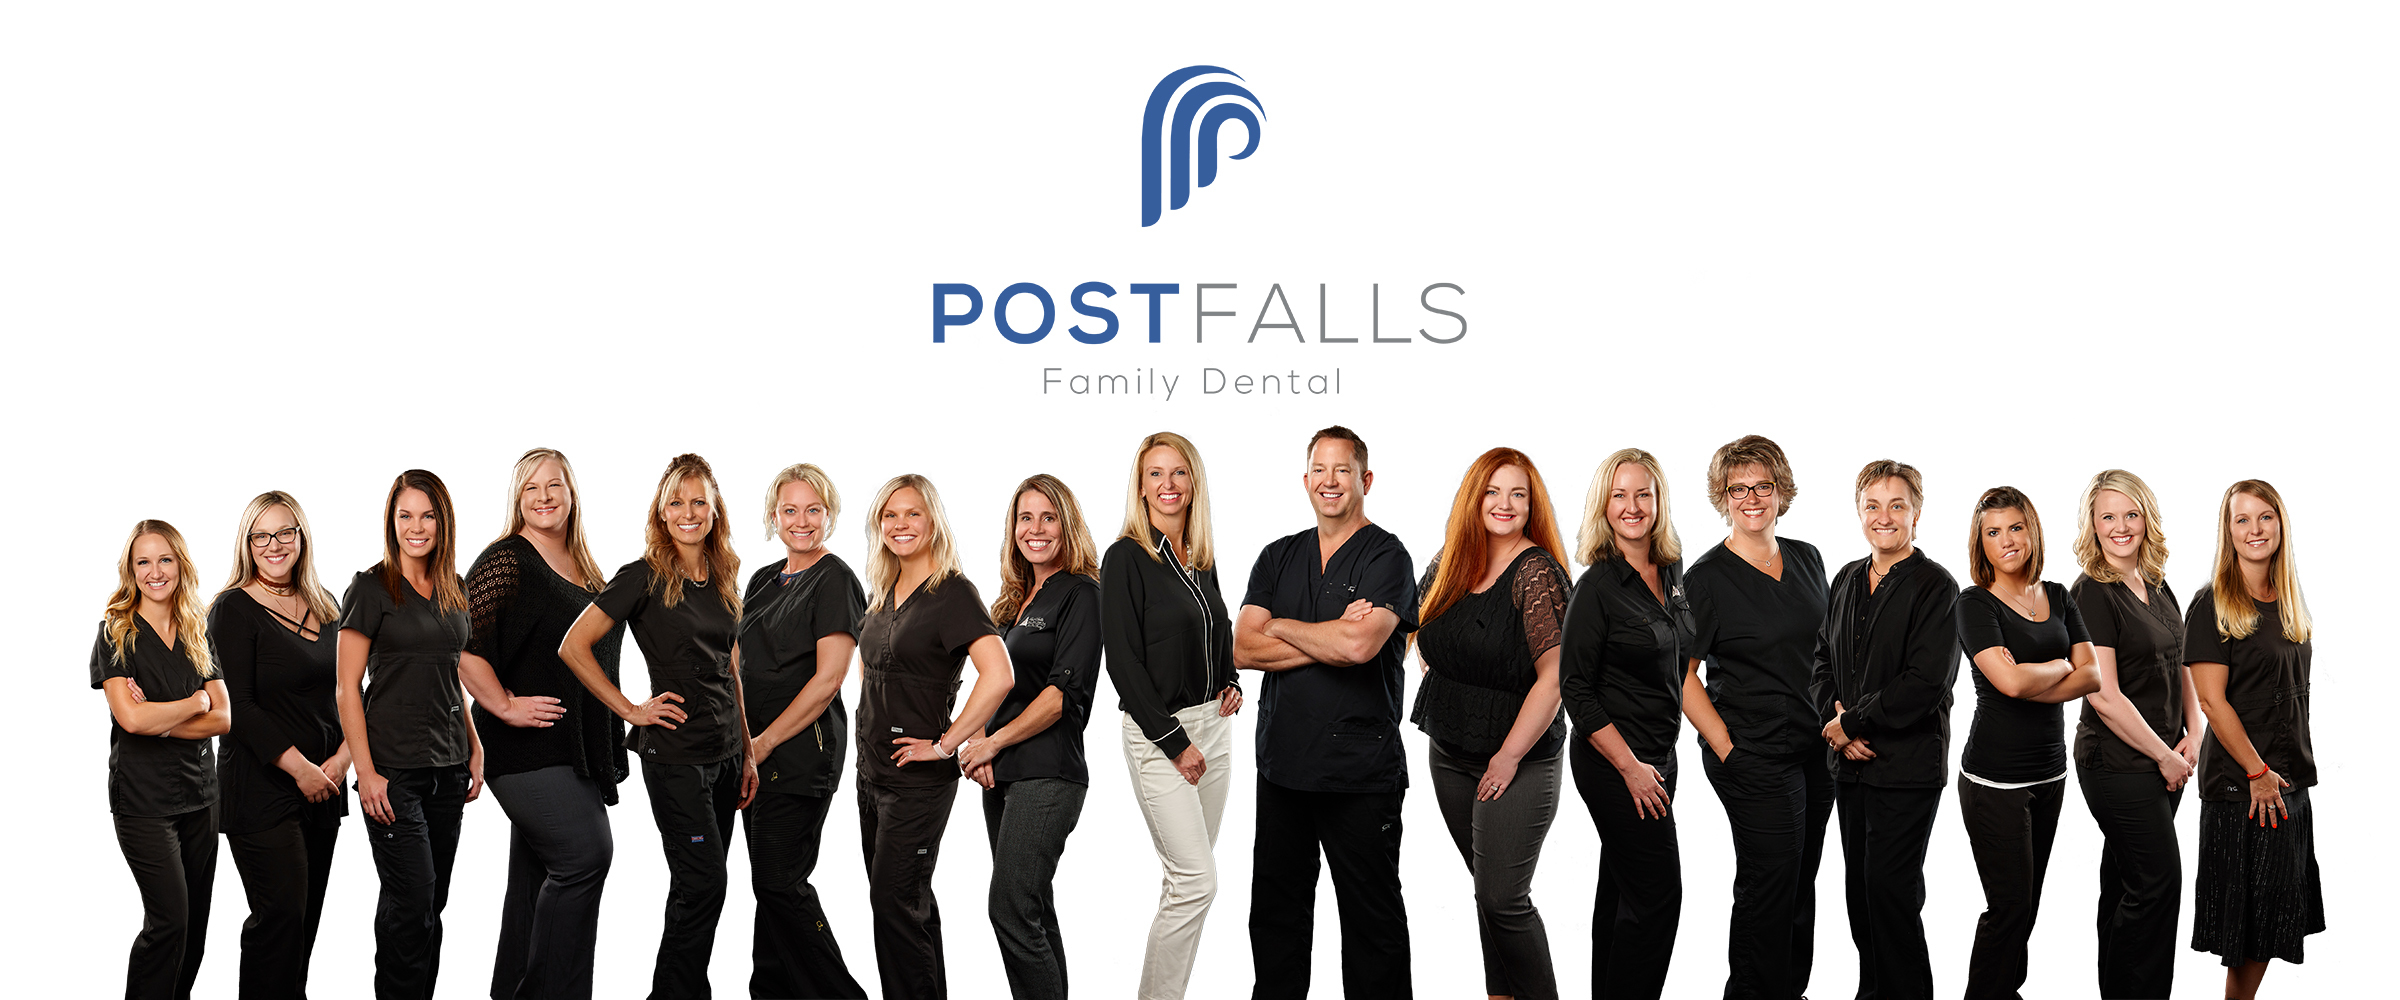 Post Falls Family Dental staff